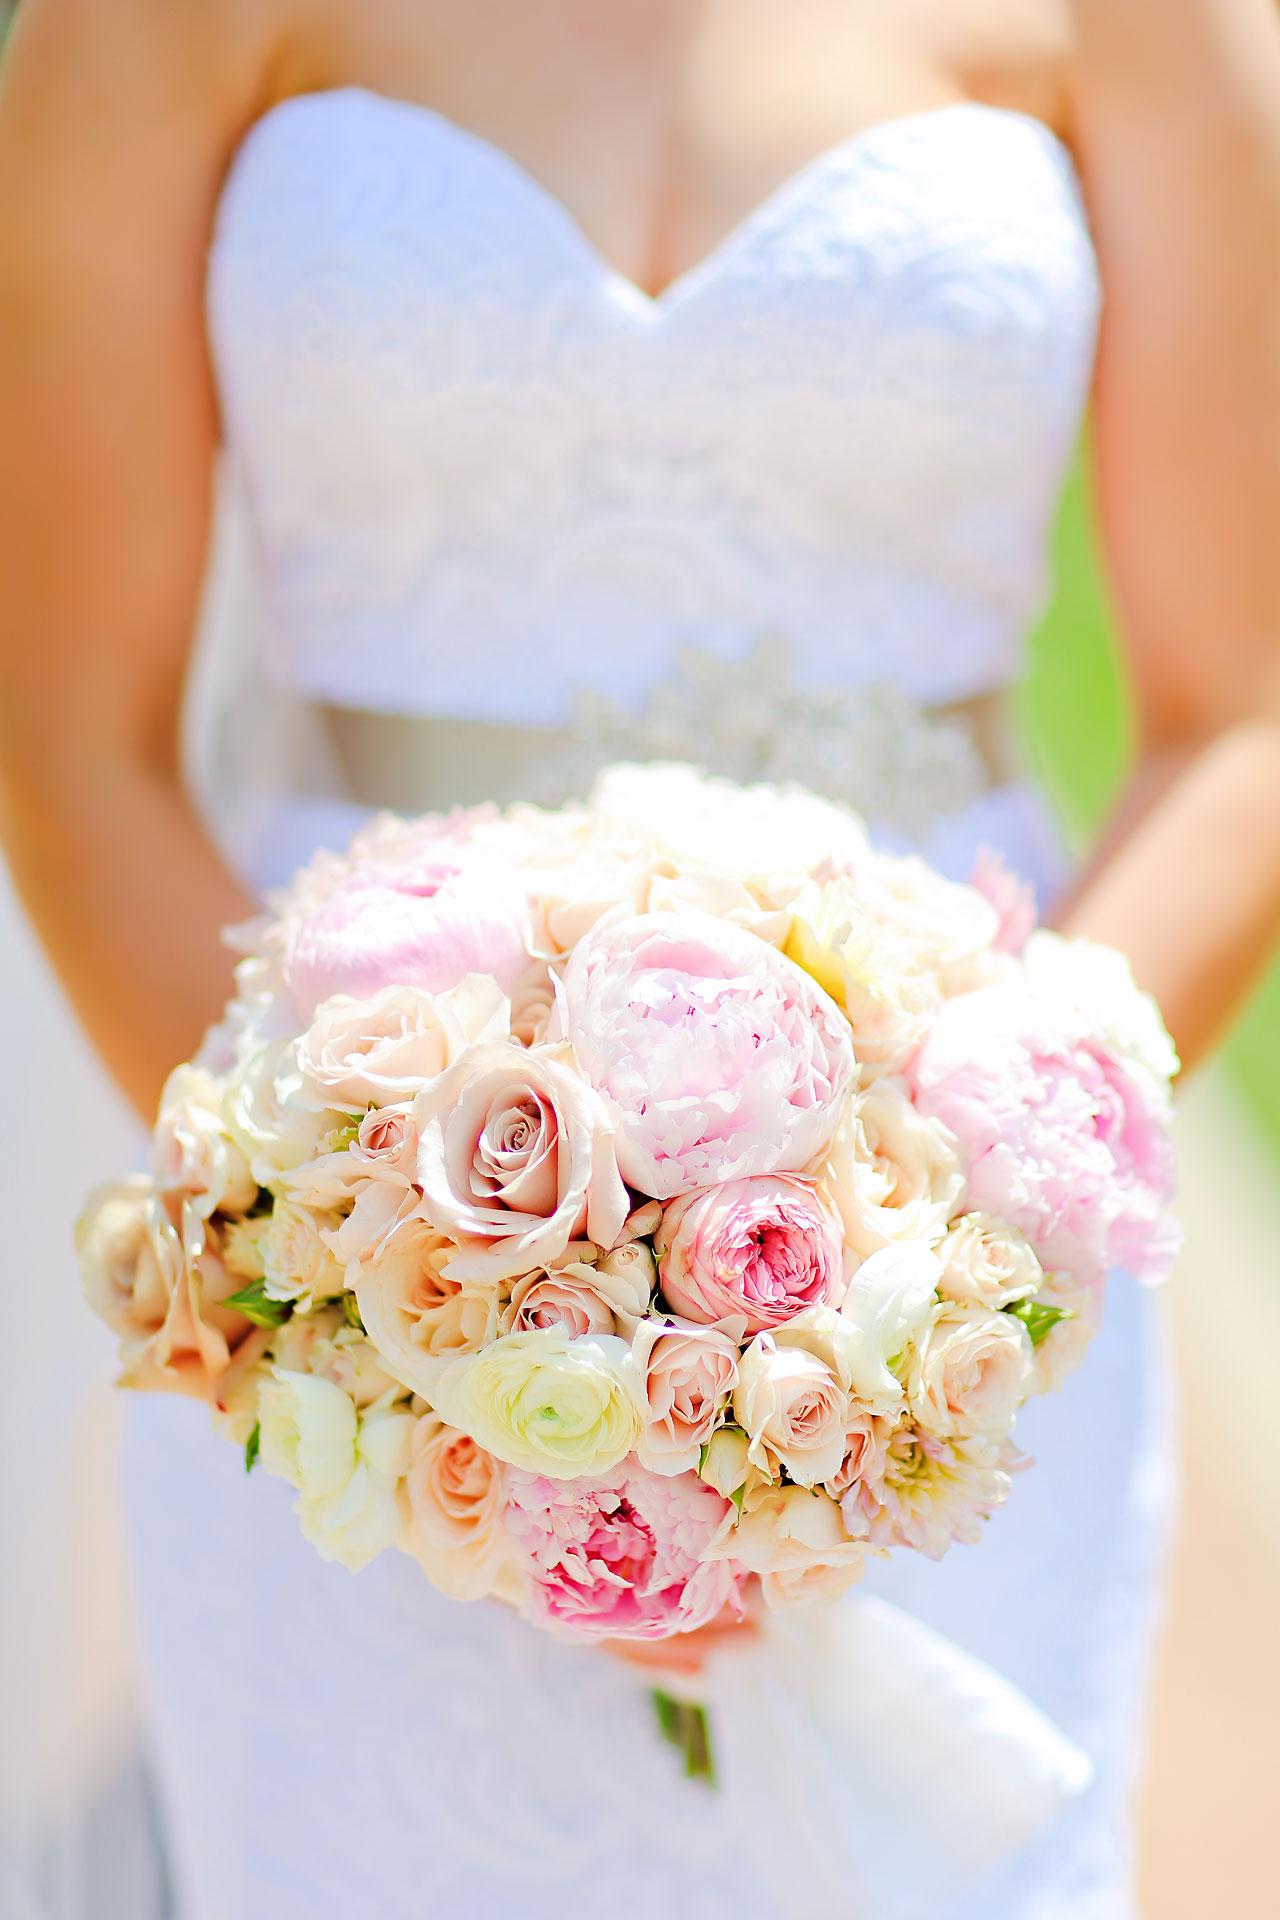 Emmy Benji Emyprean Fort Wayne Wedding 077